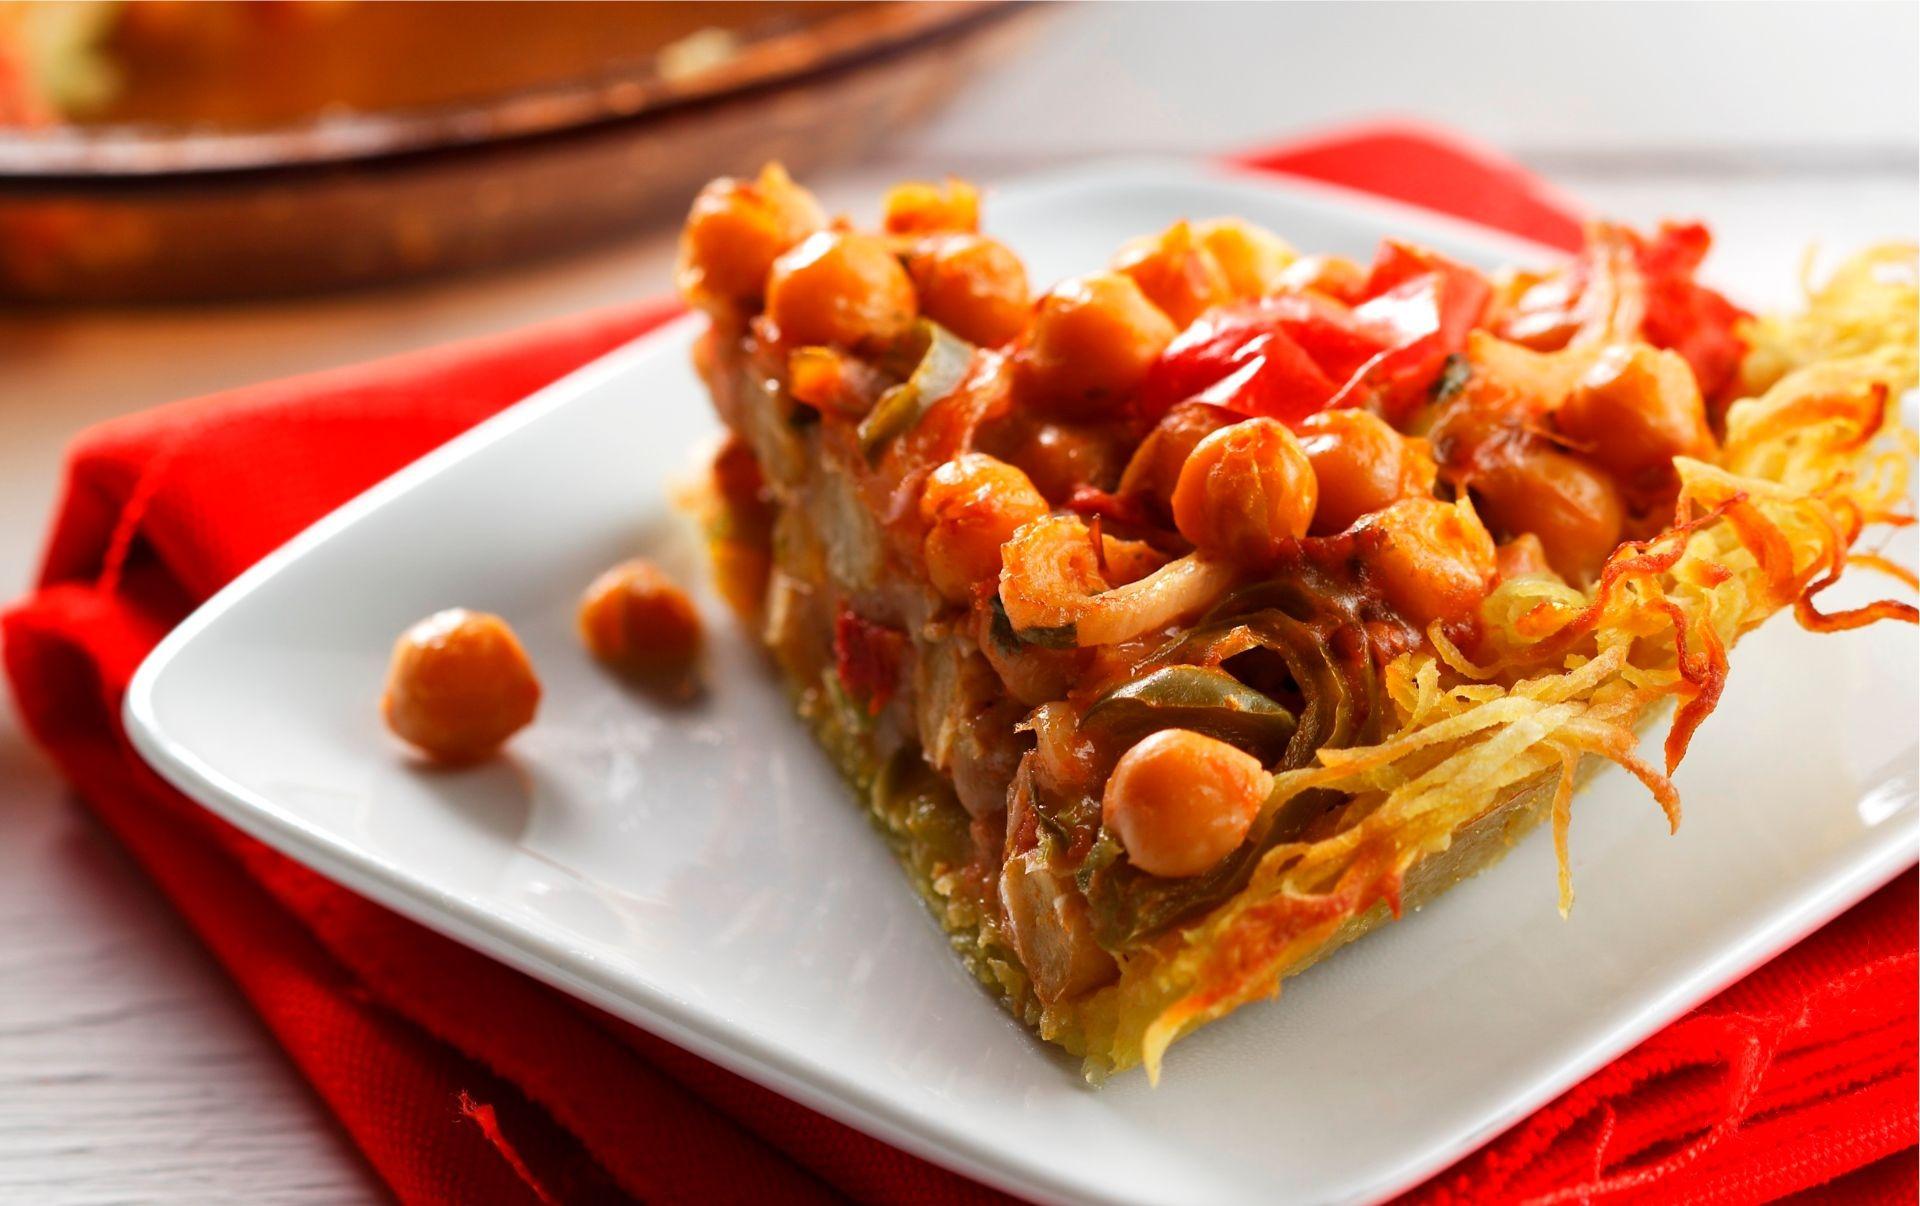 Slice of garbanzo bean pie with potato crust on white plate